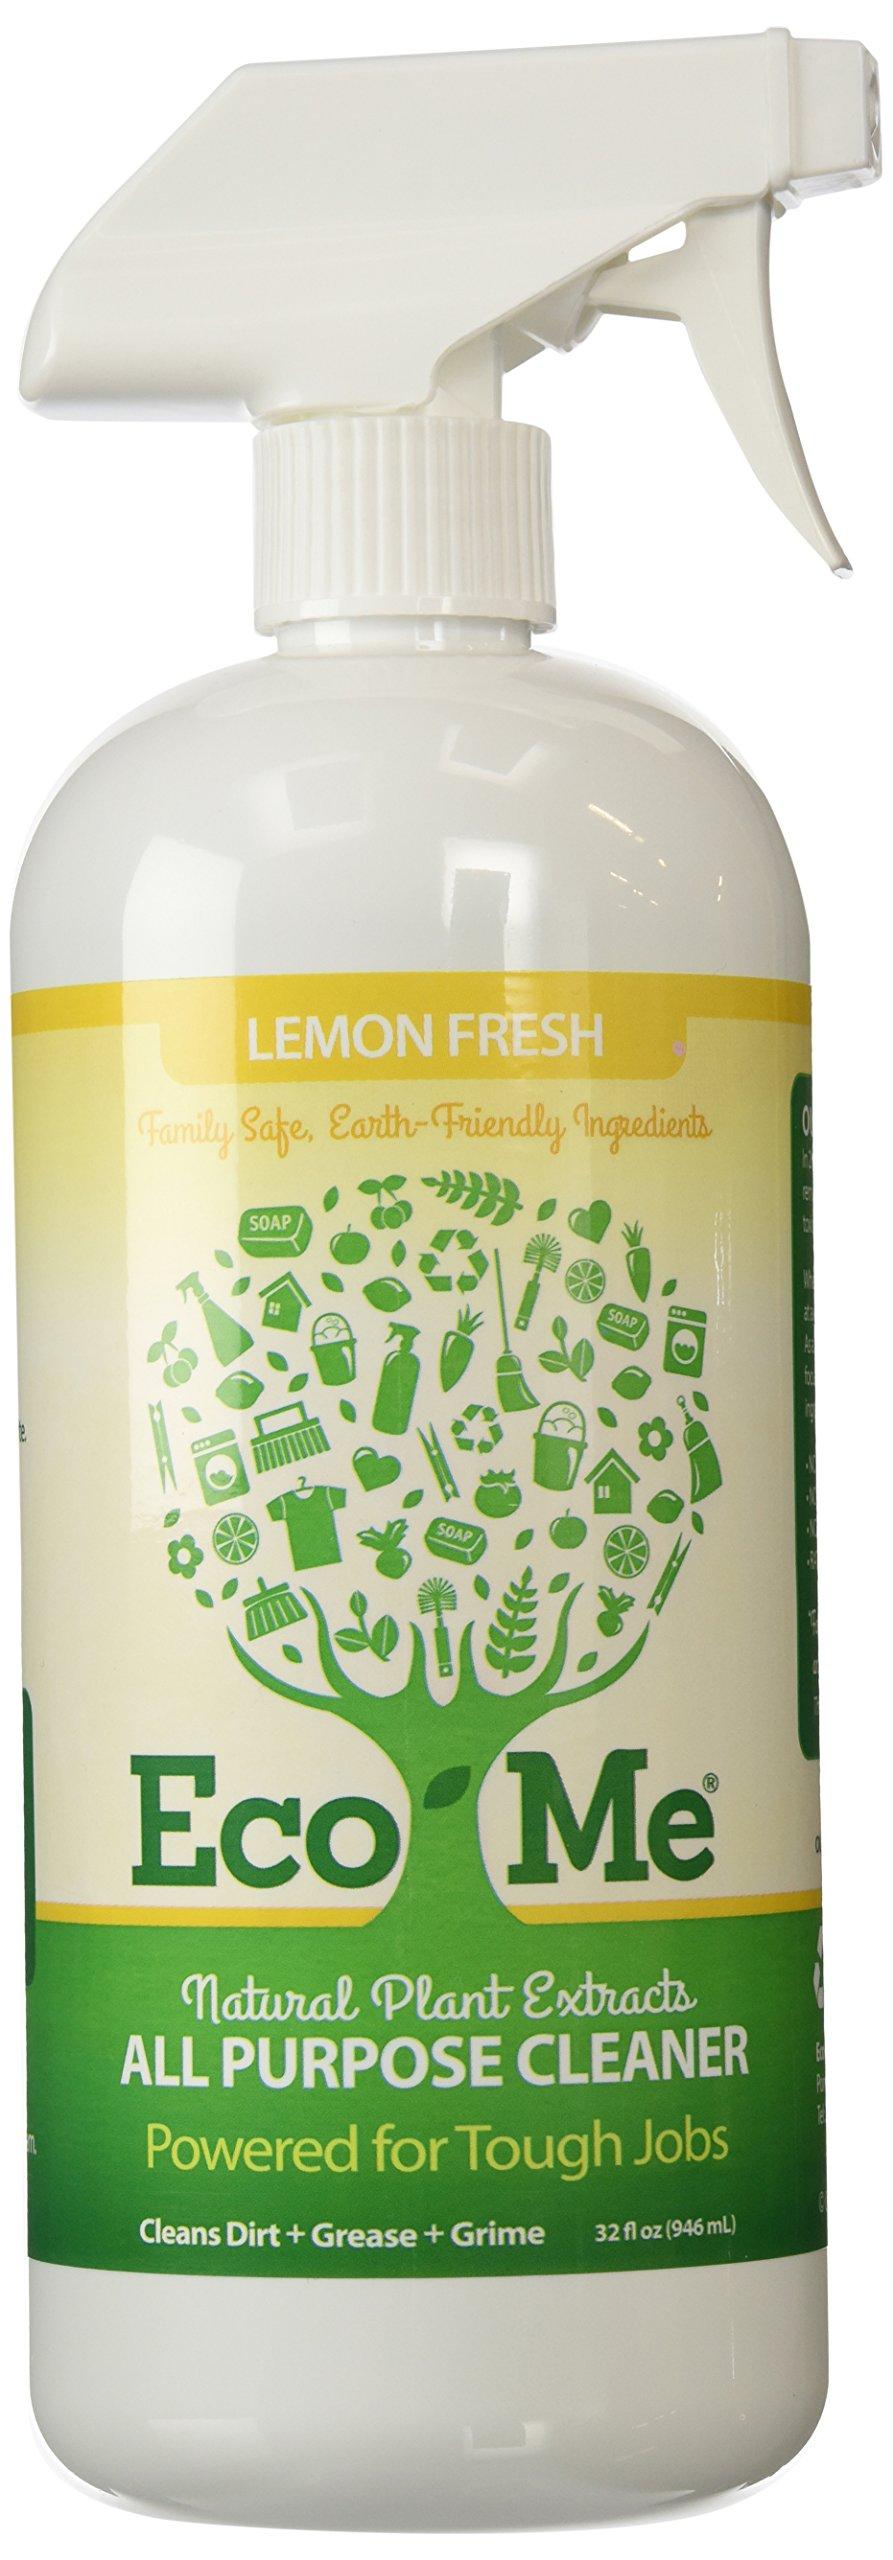 Eco-Me Natural All Purpose Cleaner, Lemon Fresh, 32 Fluid Ounce